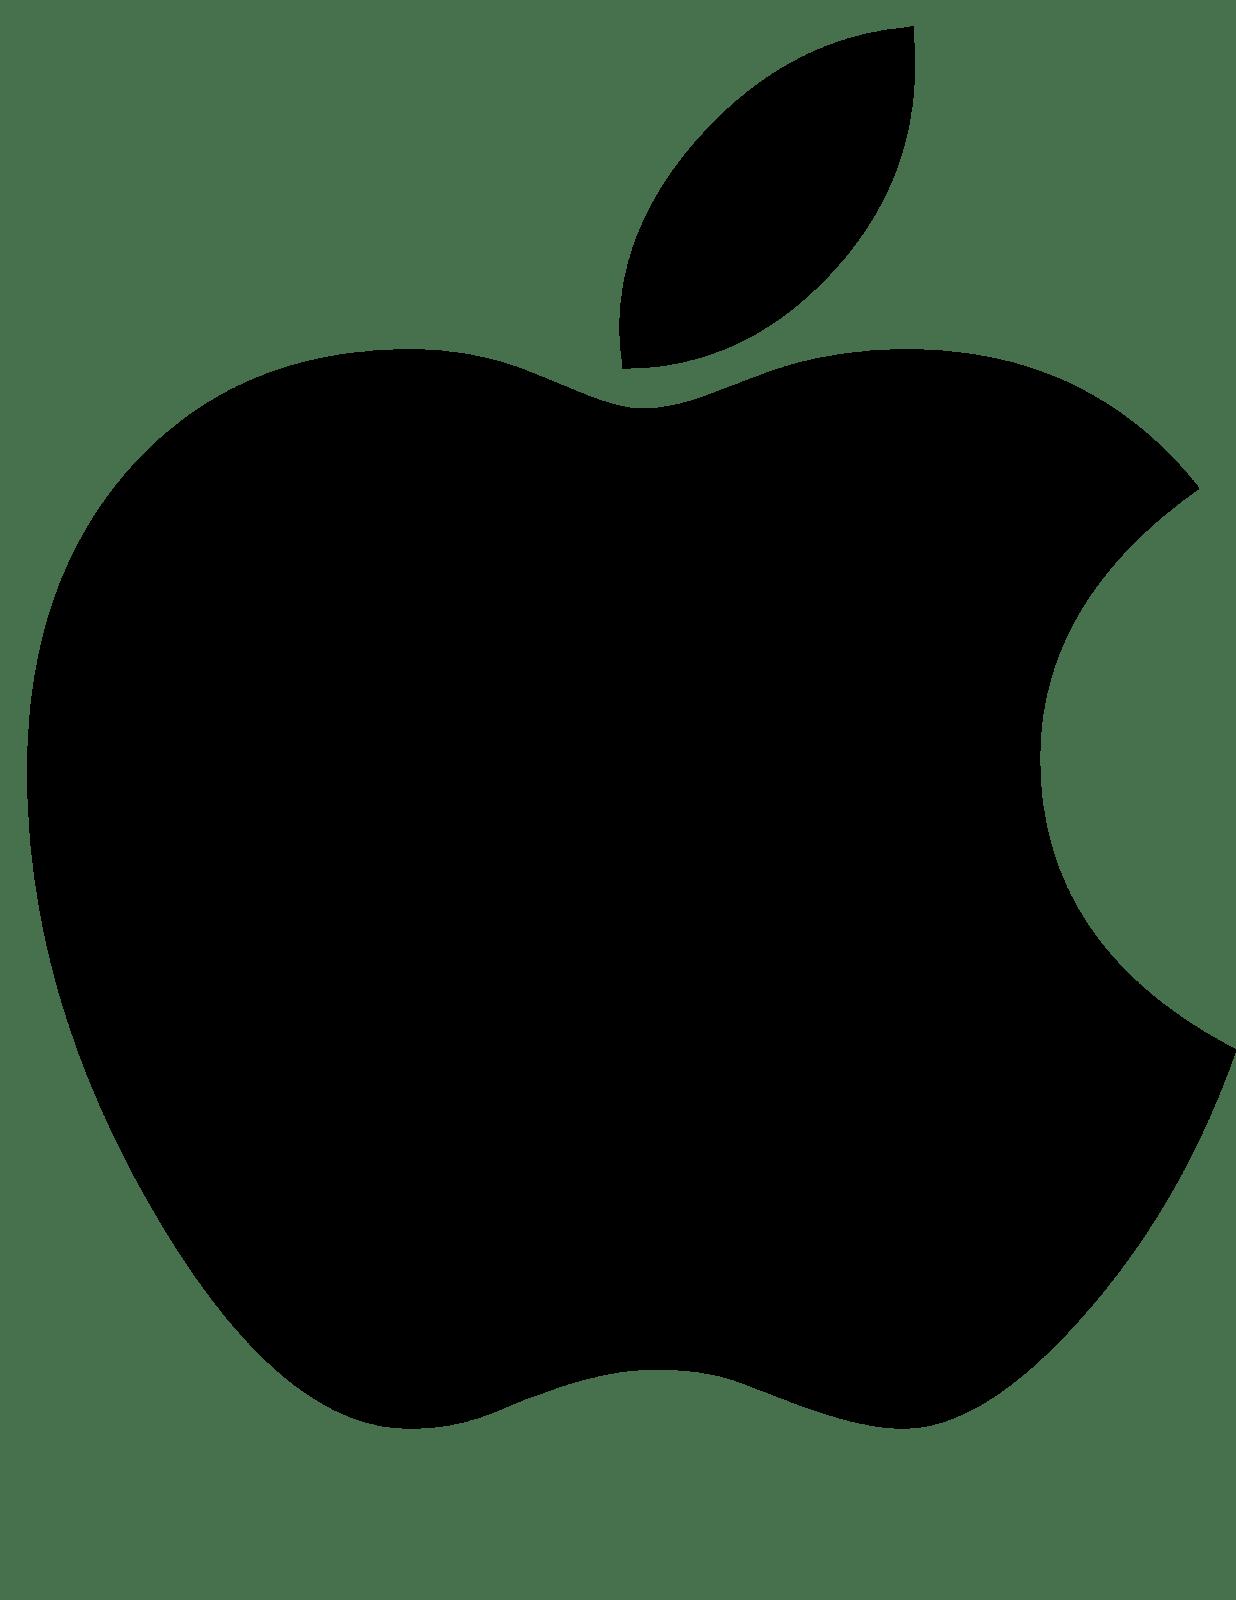 Apple's Official Logo